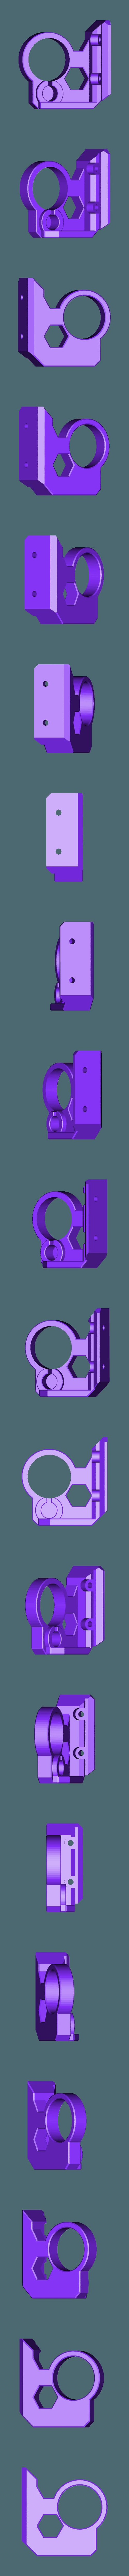 Prusa_Bearing_Mount_LHS.stl Download free STL file Z Tops for Prusa MK3S • 3D printer object, TaylorsMake